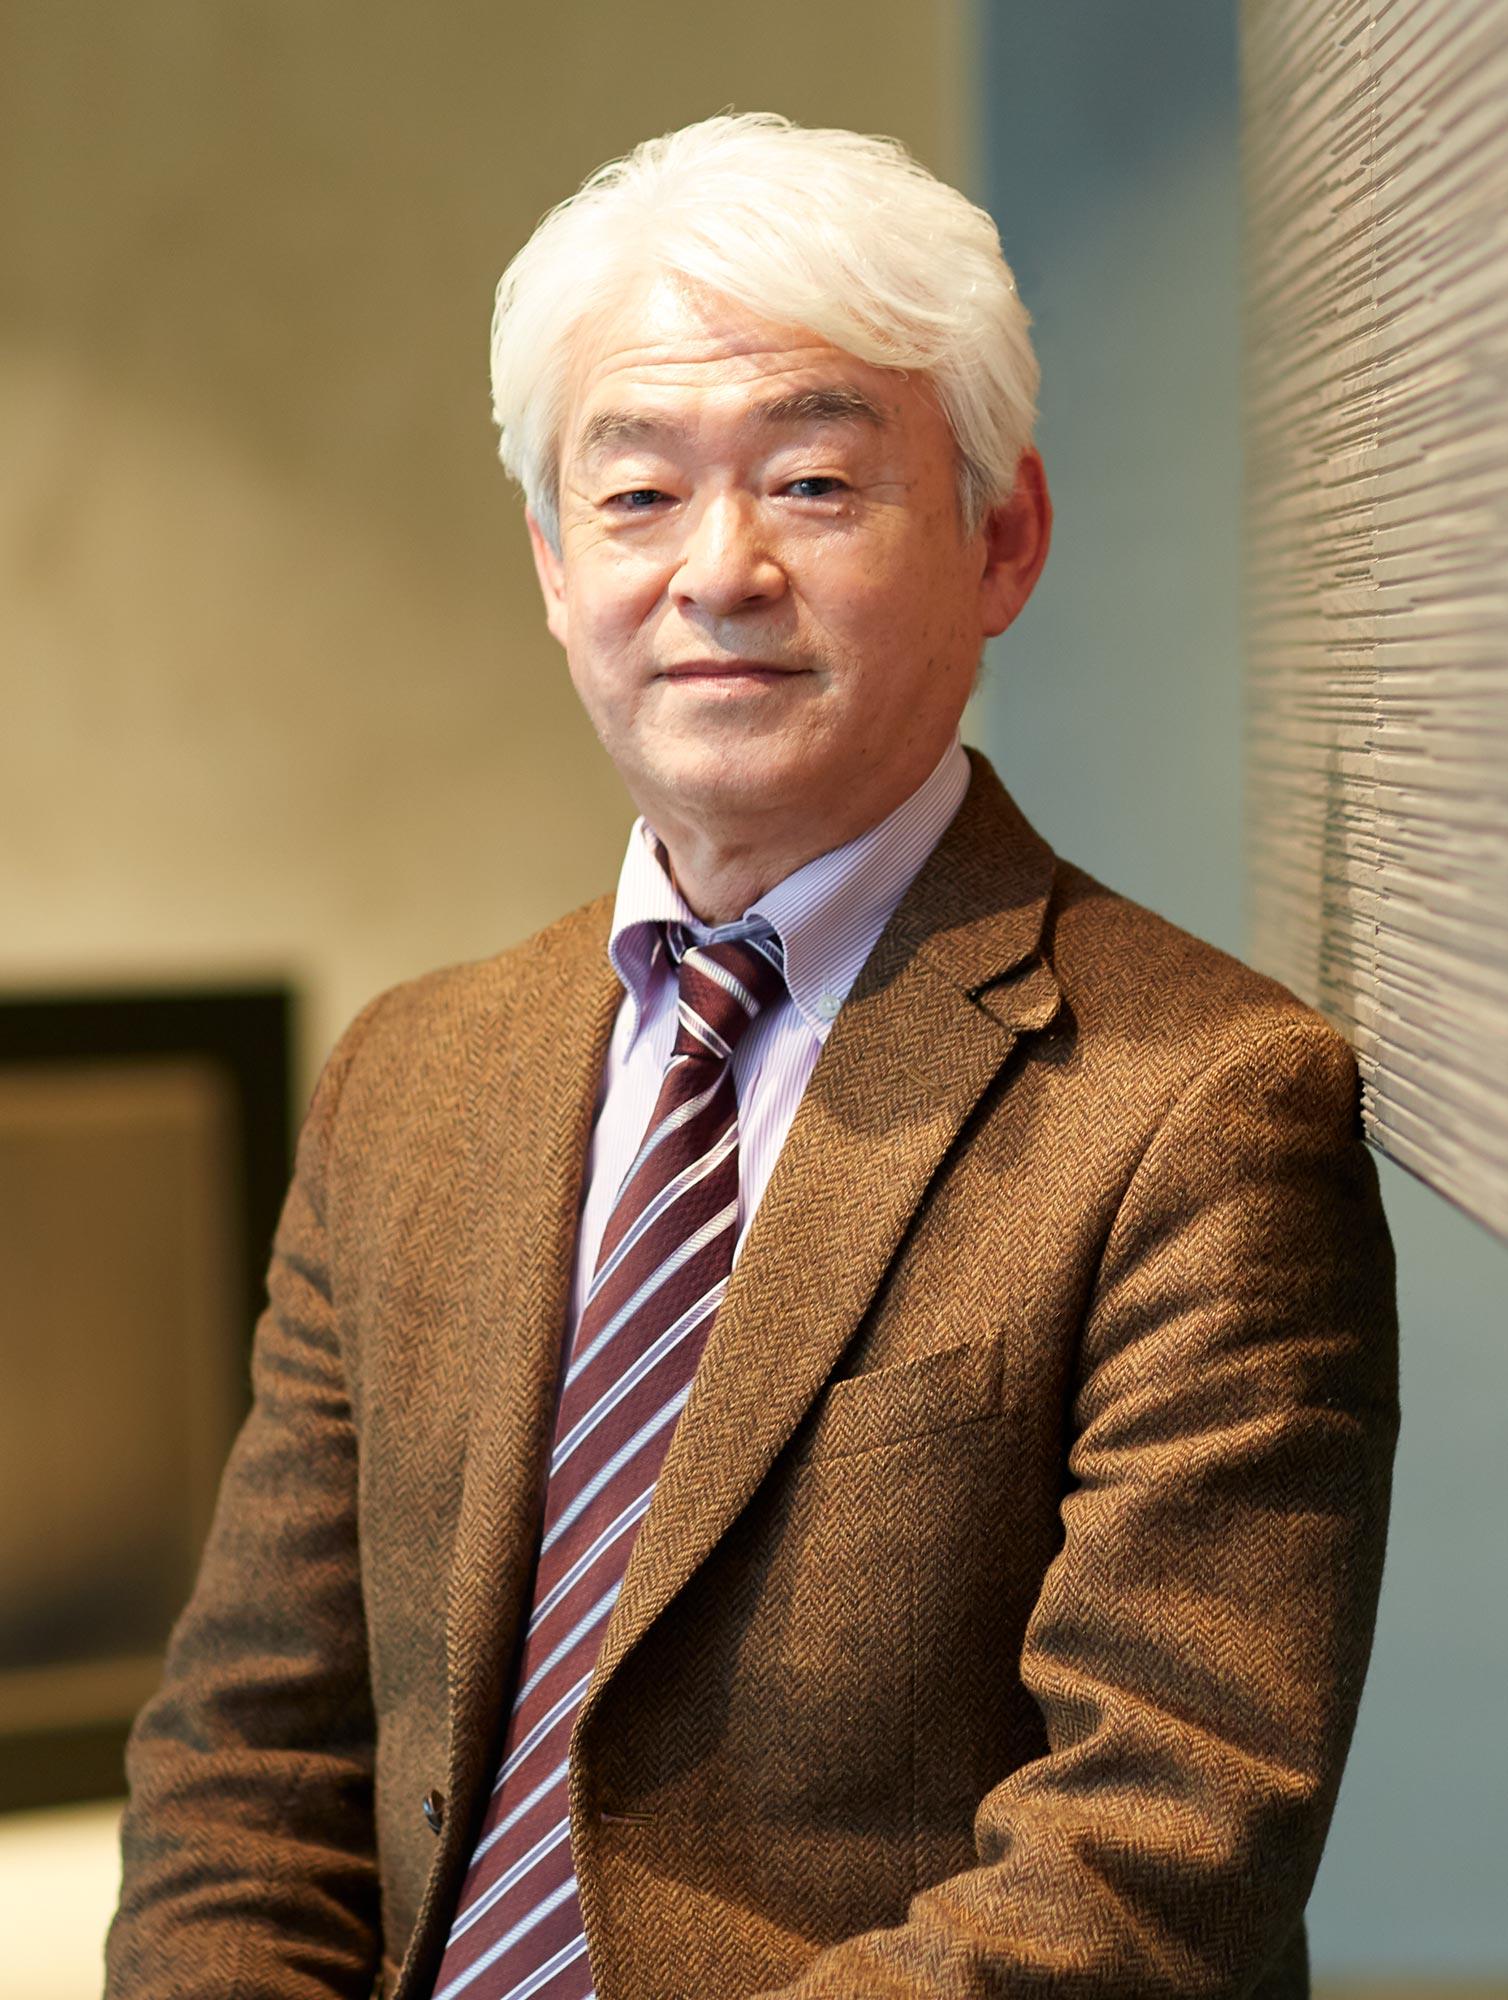 Portrait of Nobuhiro Kosugi wearing a brown tweed suit.